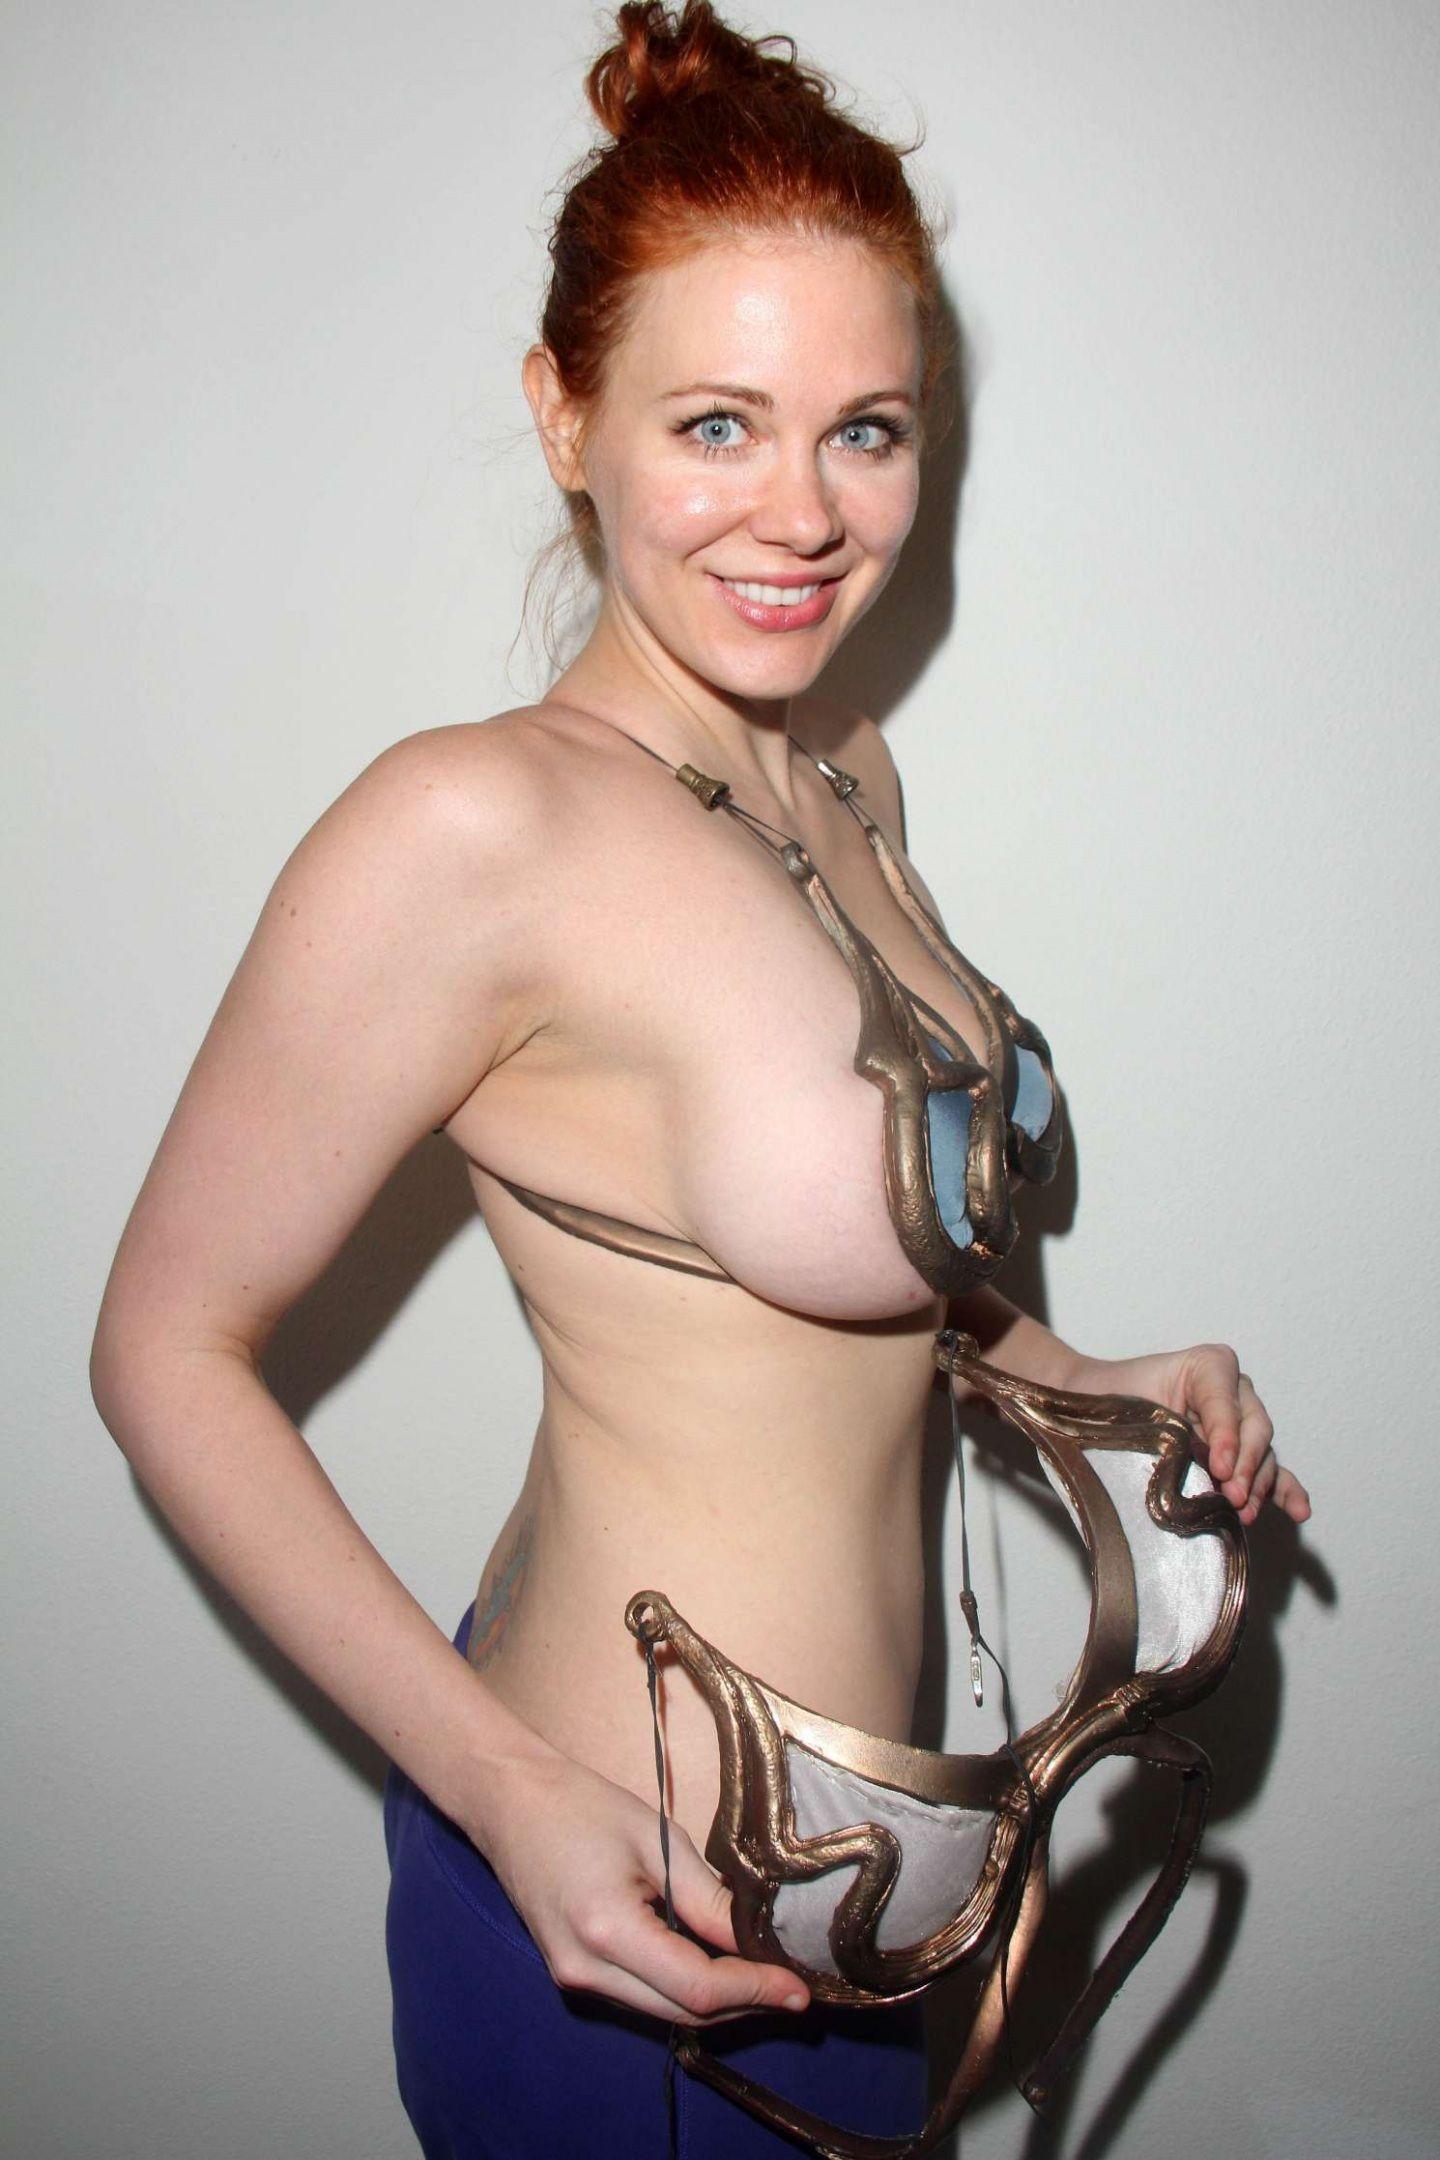 nude (12 photos), Is a cute Celebrites fotos